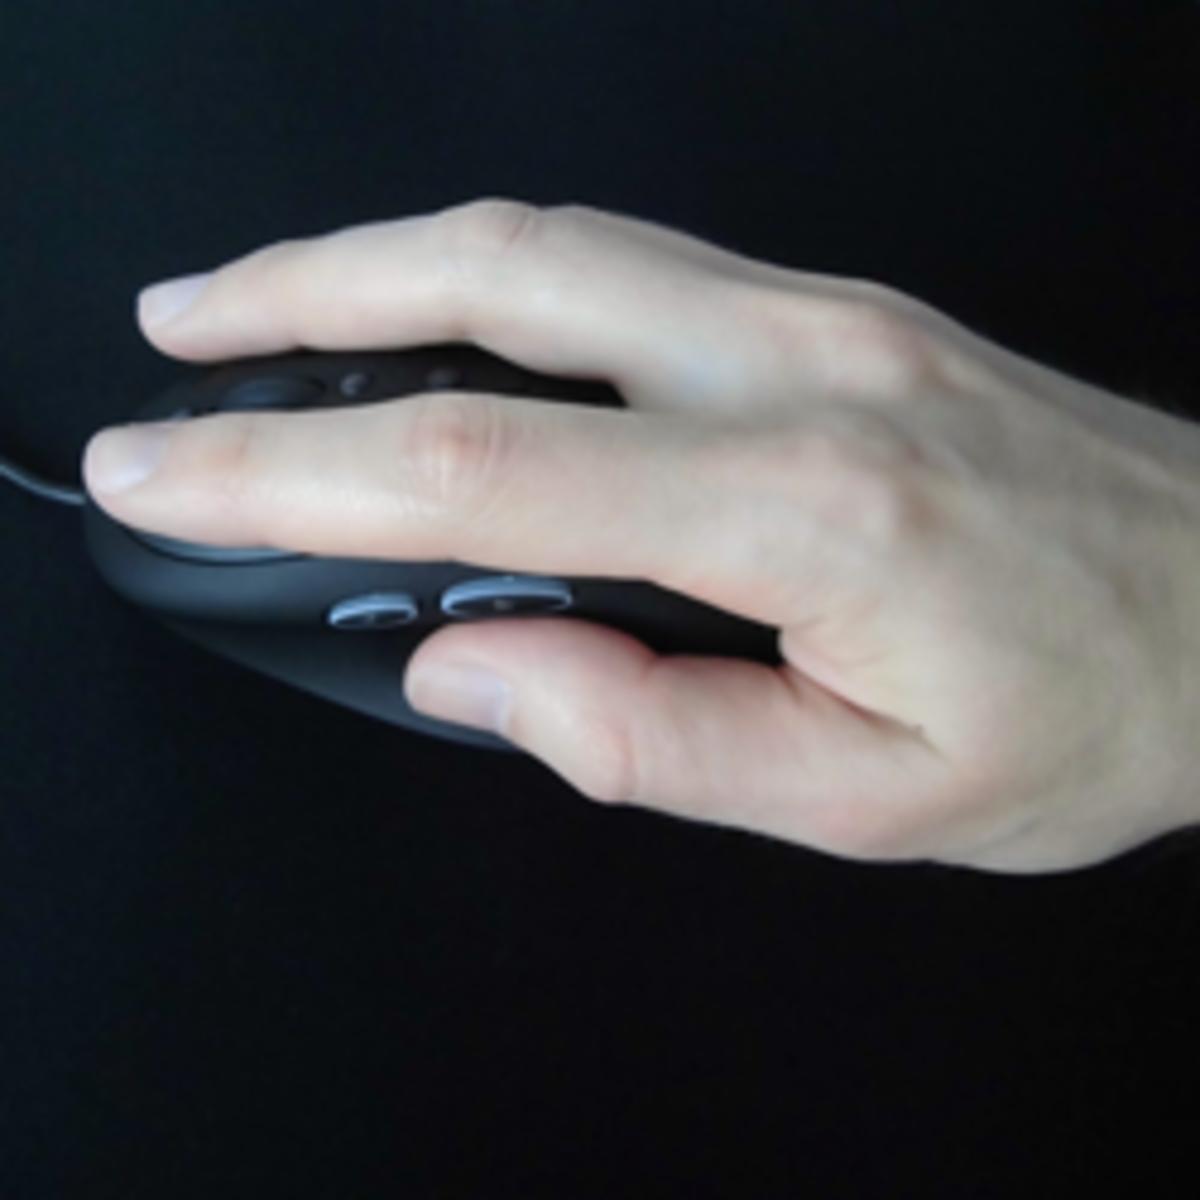 Using my Logitech G400 in palm grip.